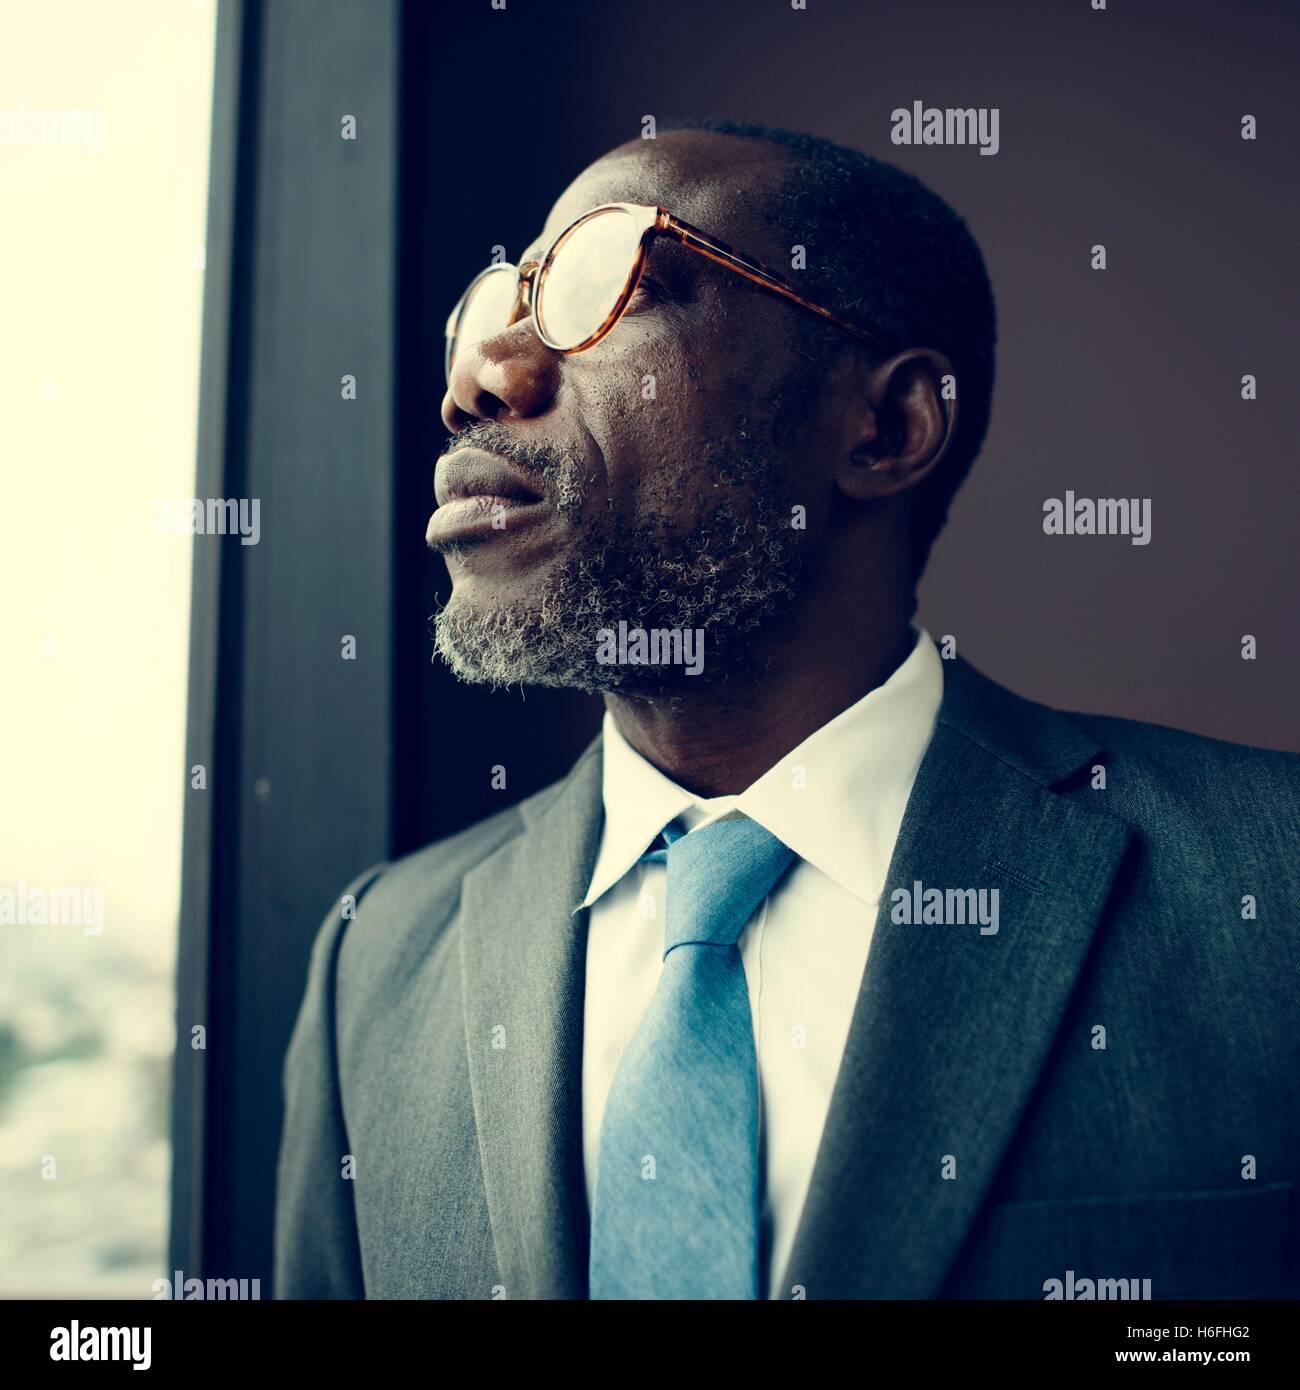 African Descent Businessman Contemplation Concept - Stock Image